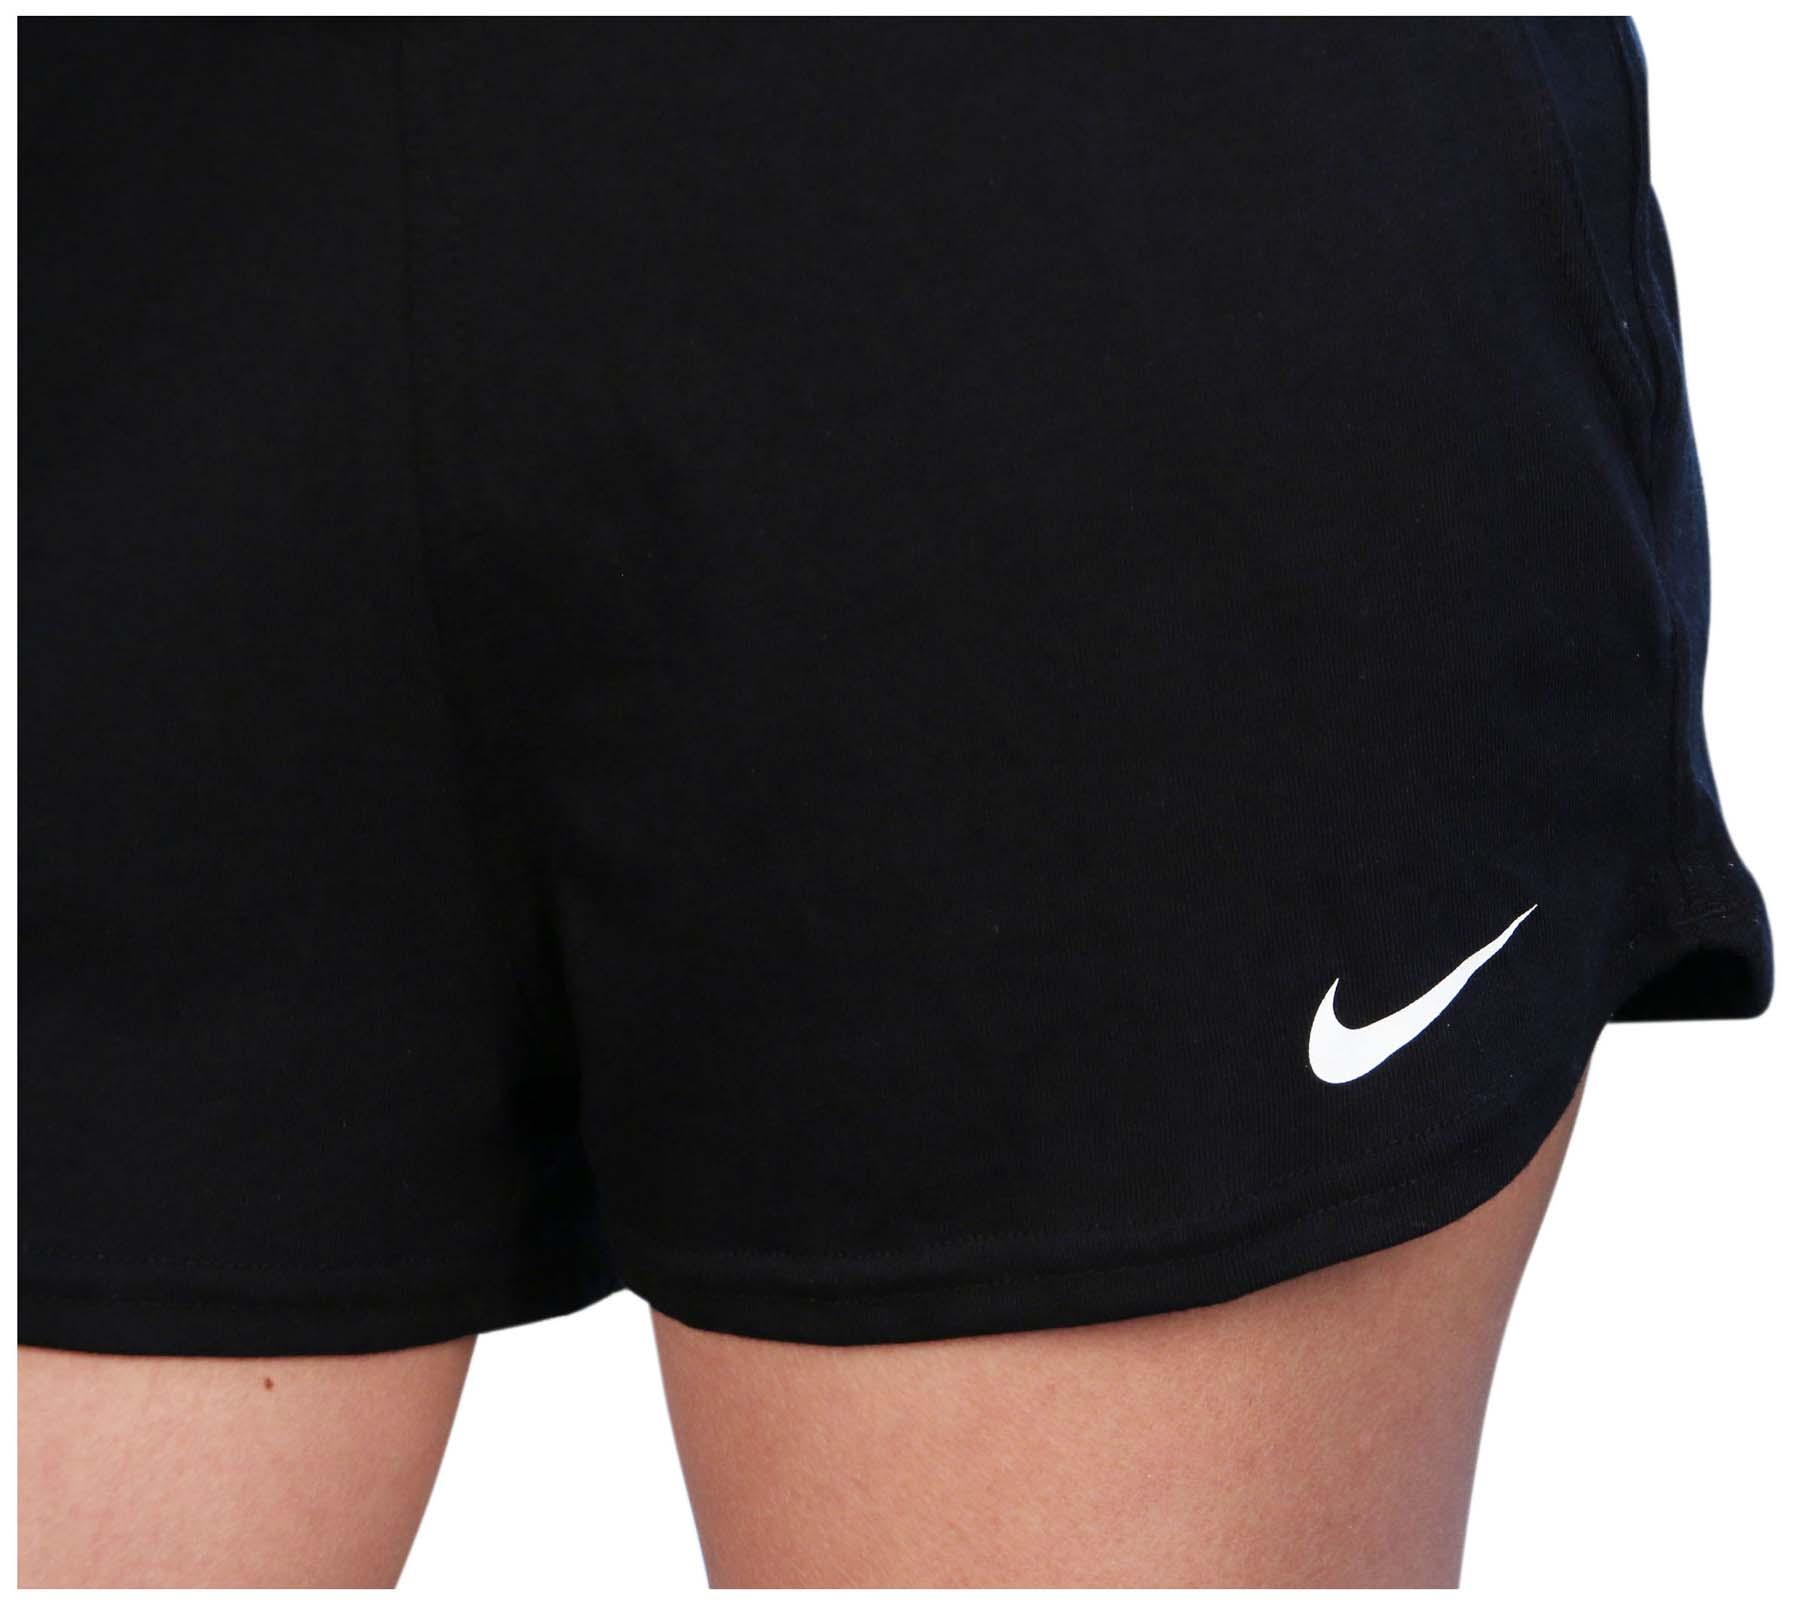 Nike Women's Prep Romper Overall Sport Casual Shorts | eBay